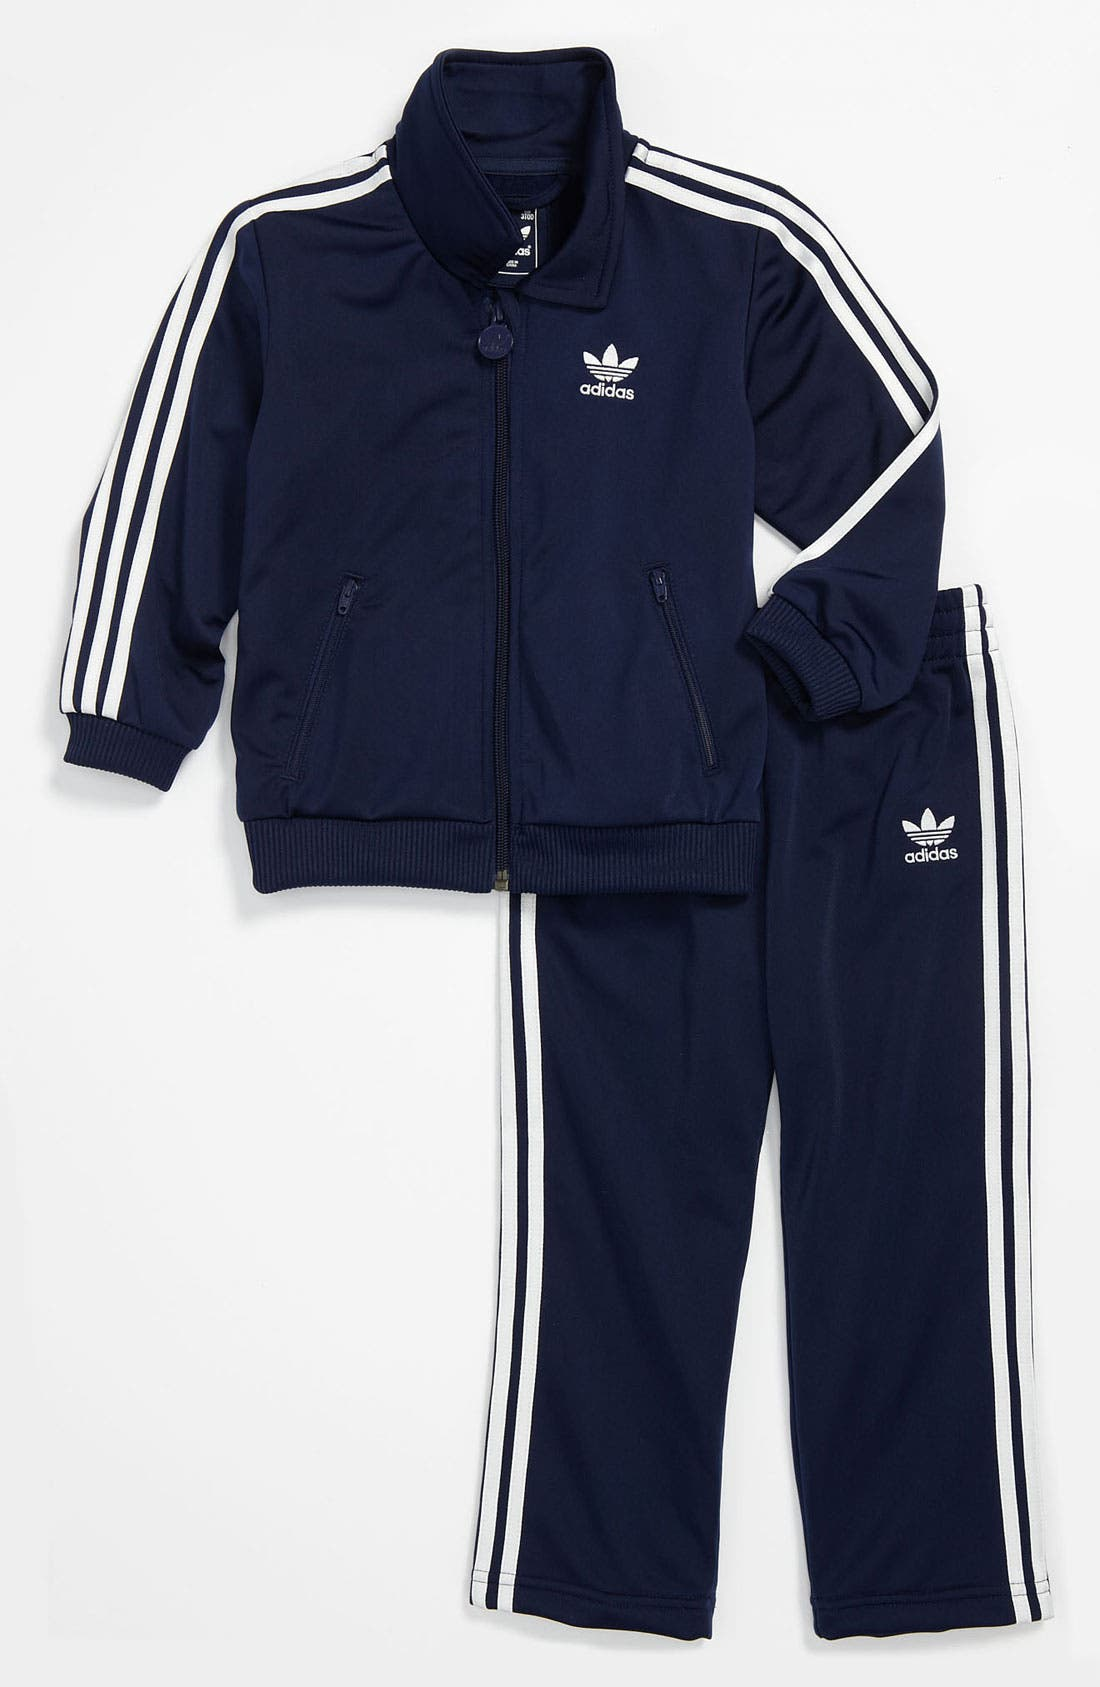 Alternate Image 1 Selected - adidas 'Firebird' Jacket & Pants (Infant)